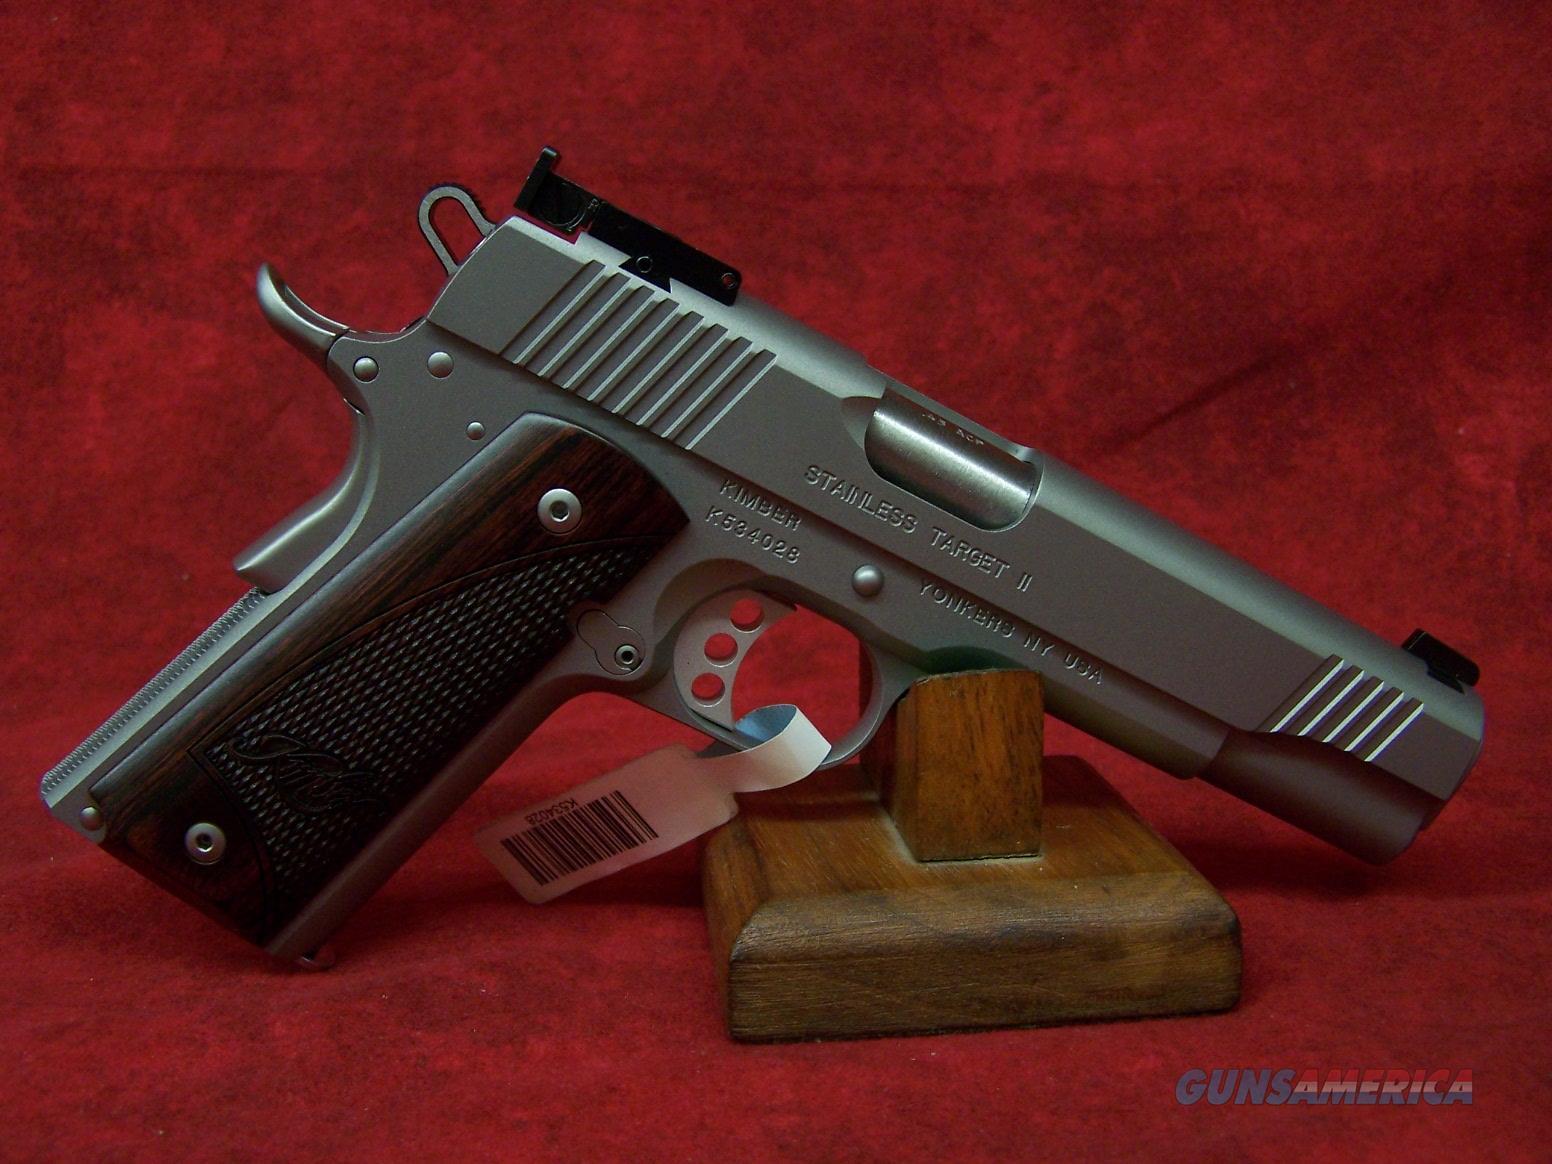 Kimber Stainless Target II .45 ACP (2016) (32325)  Guns > Pistols > Kimber of America Pistols